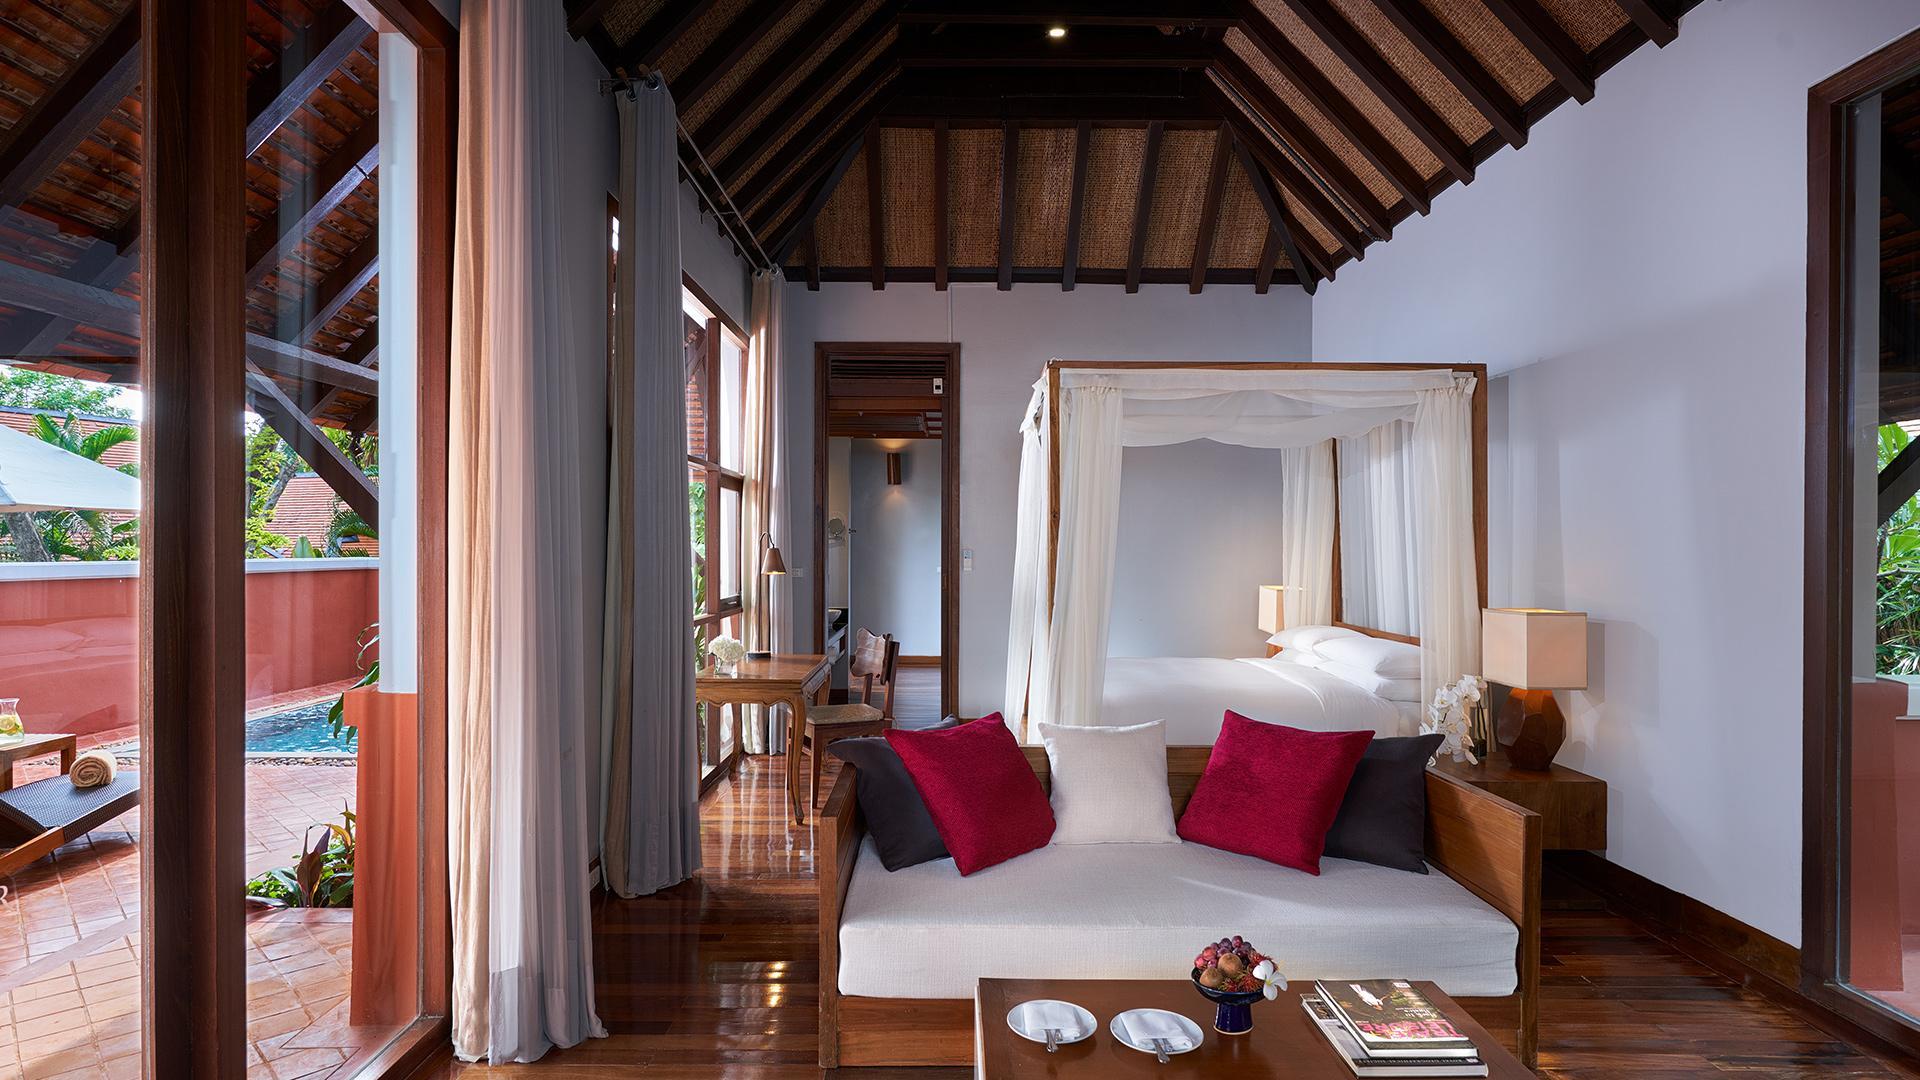 Pool Villa Garden image 1 at Renaissance Koh Samui Resort & Spa by Amphoe Ko Samui, Chang Wat Surat Thani, Thailand